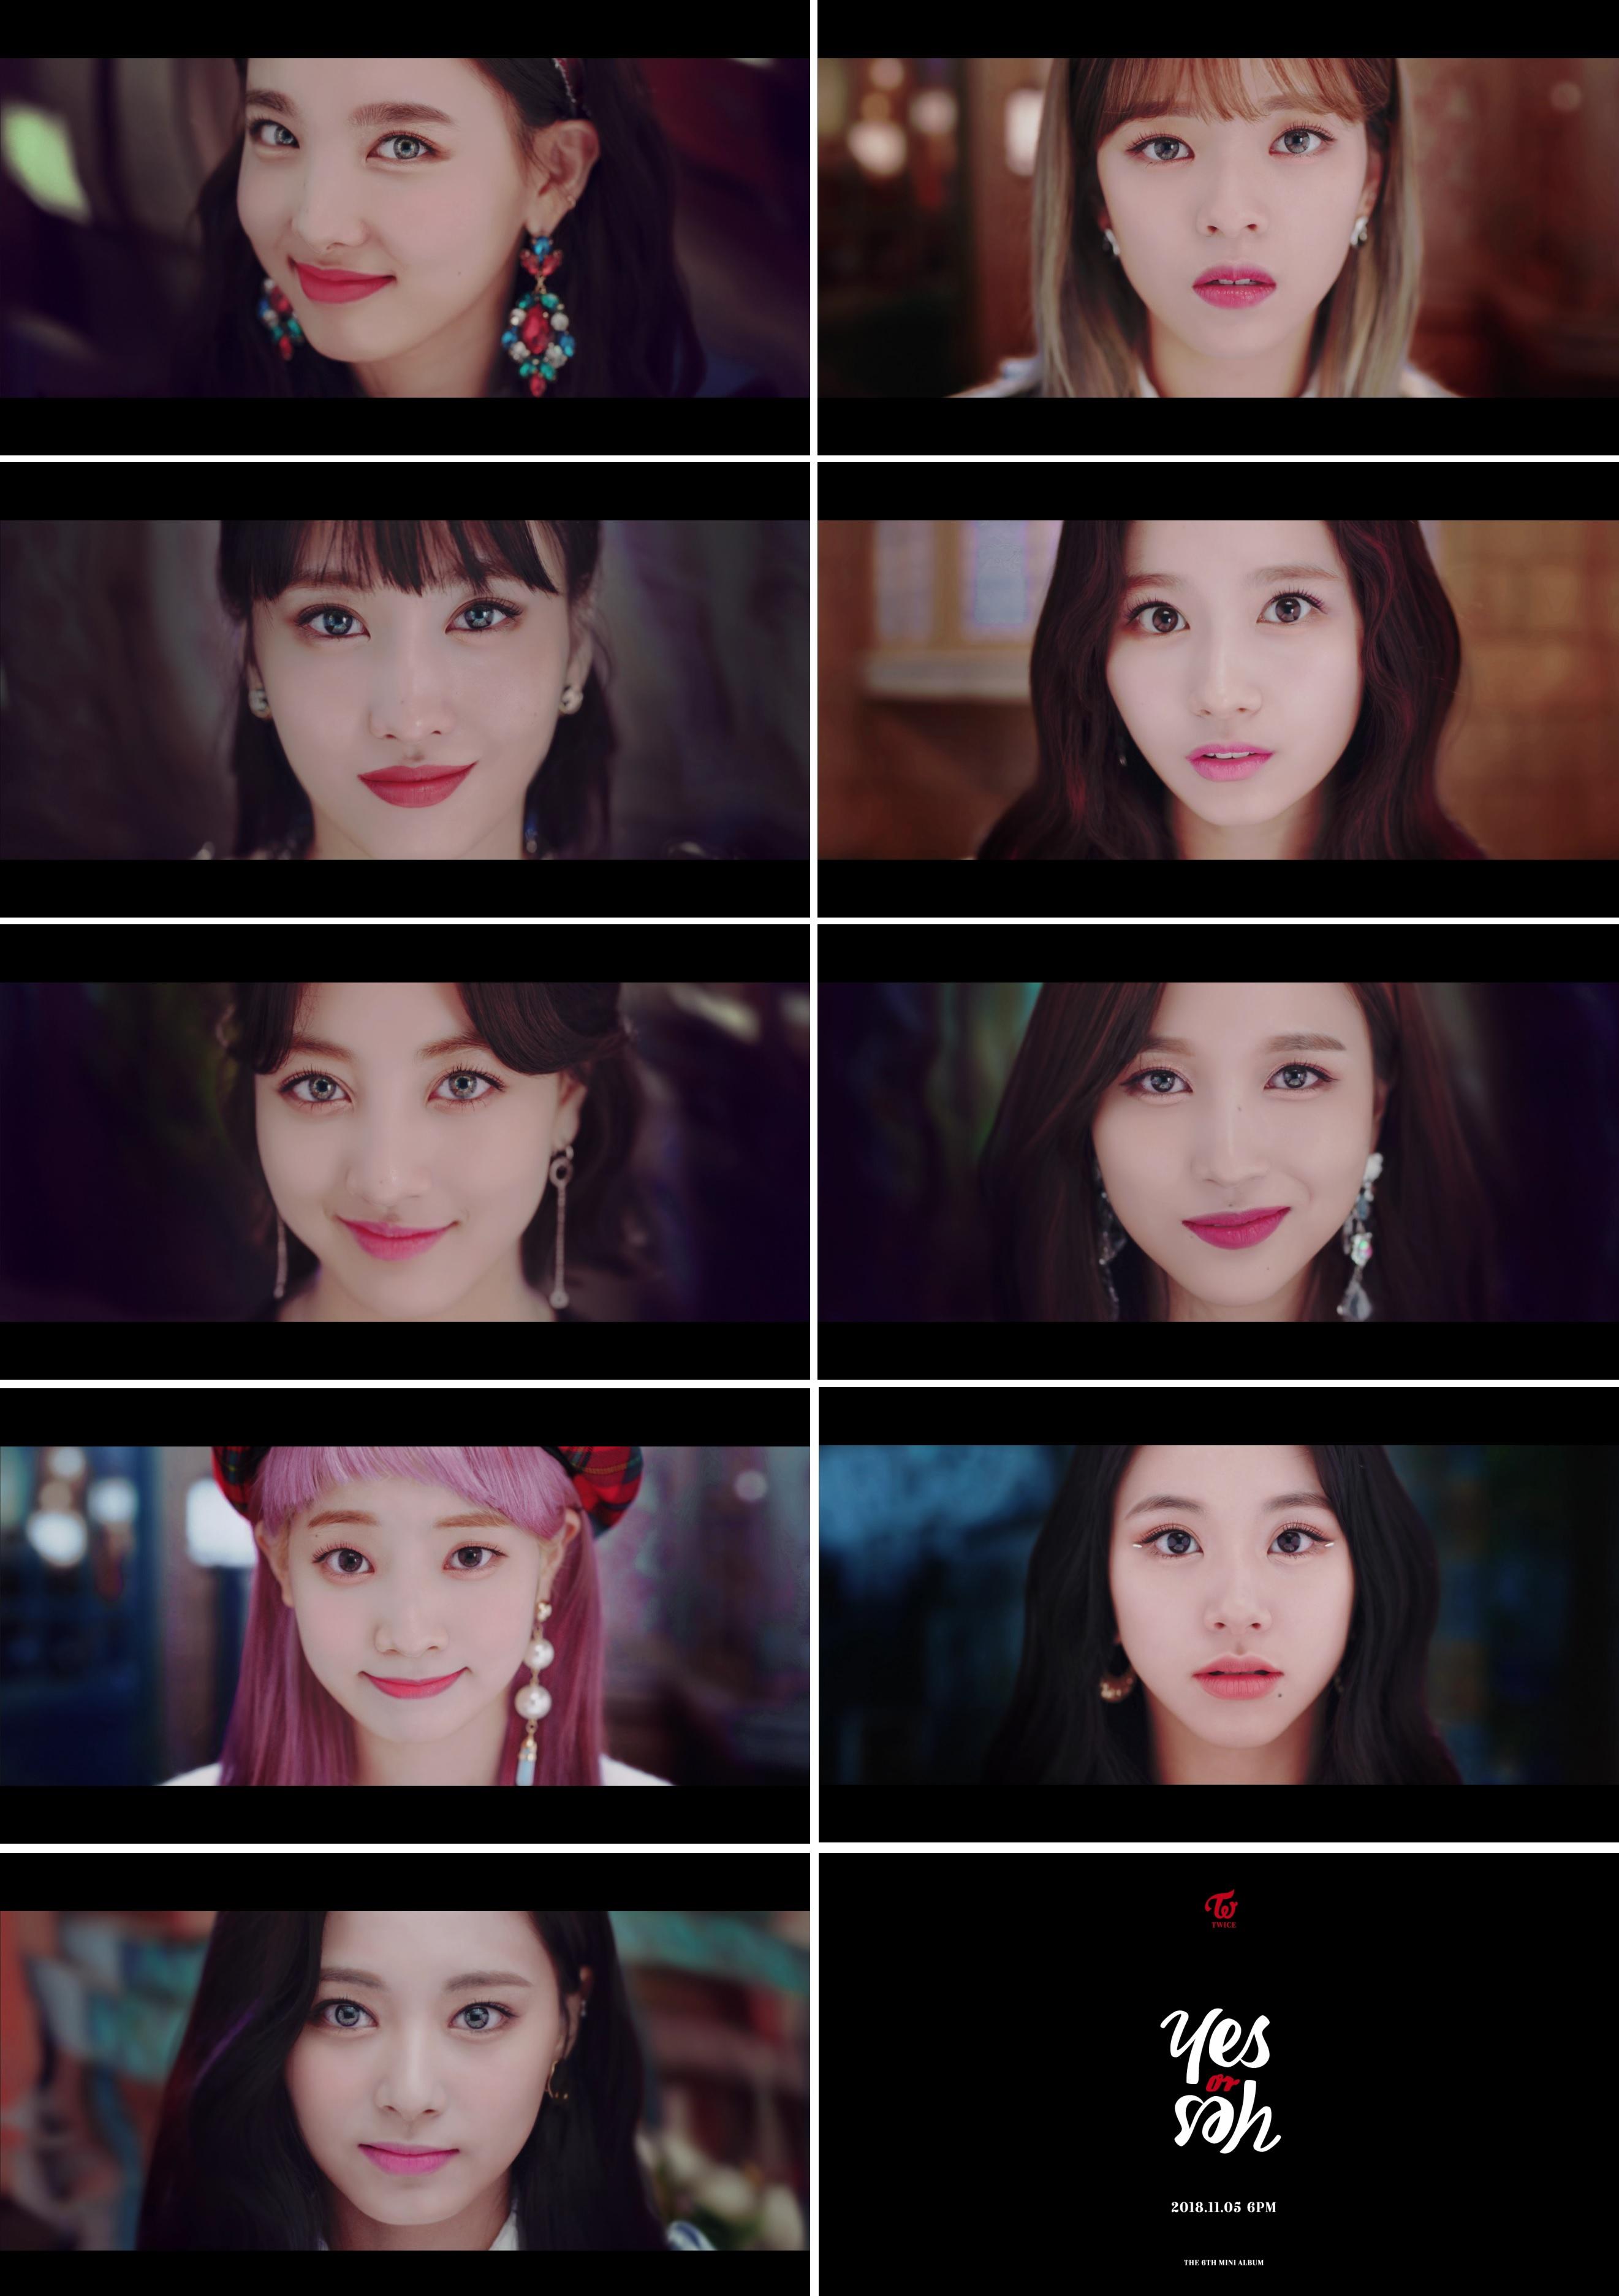 "Yes Or No Tarot Spreads: 트와이스, 신곡 'YES Or YES' MV 티저 영상 첫 공개...""빠져드는 매력"""